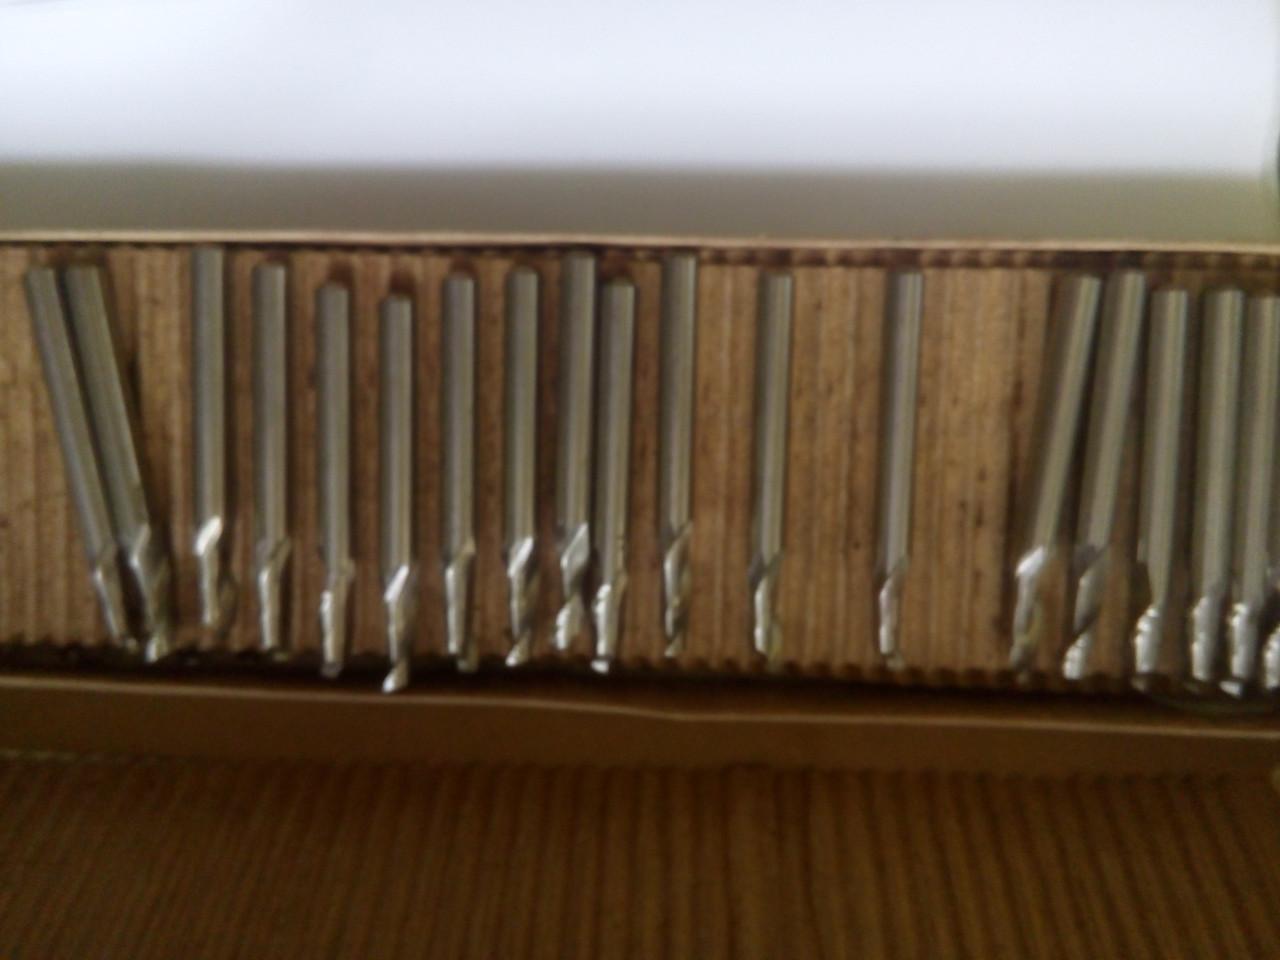 Фреза для ПВХ профилей (концевая однозубая)  8 мм,